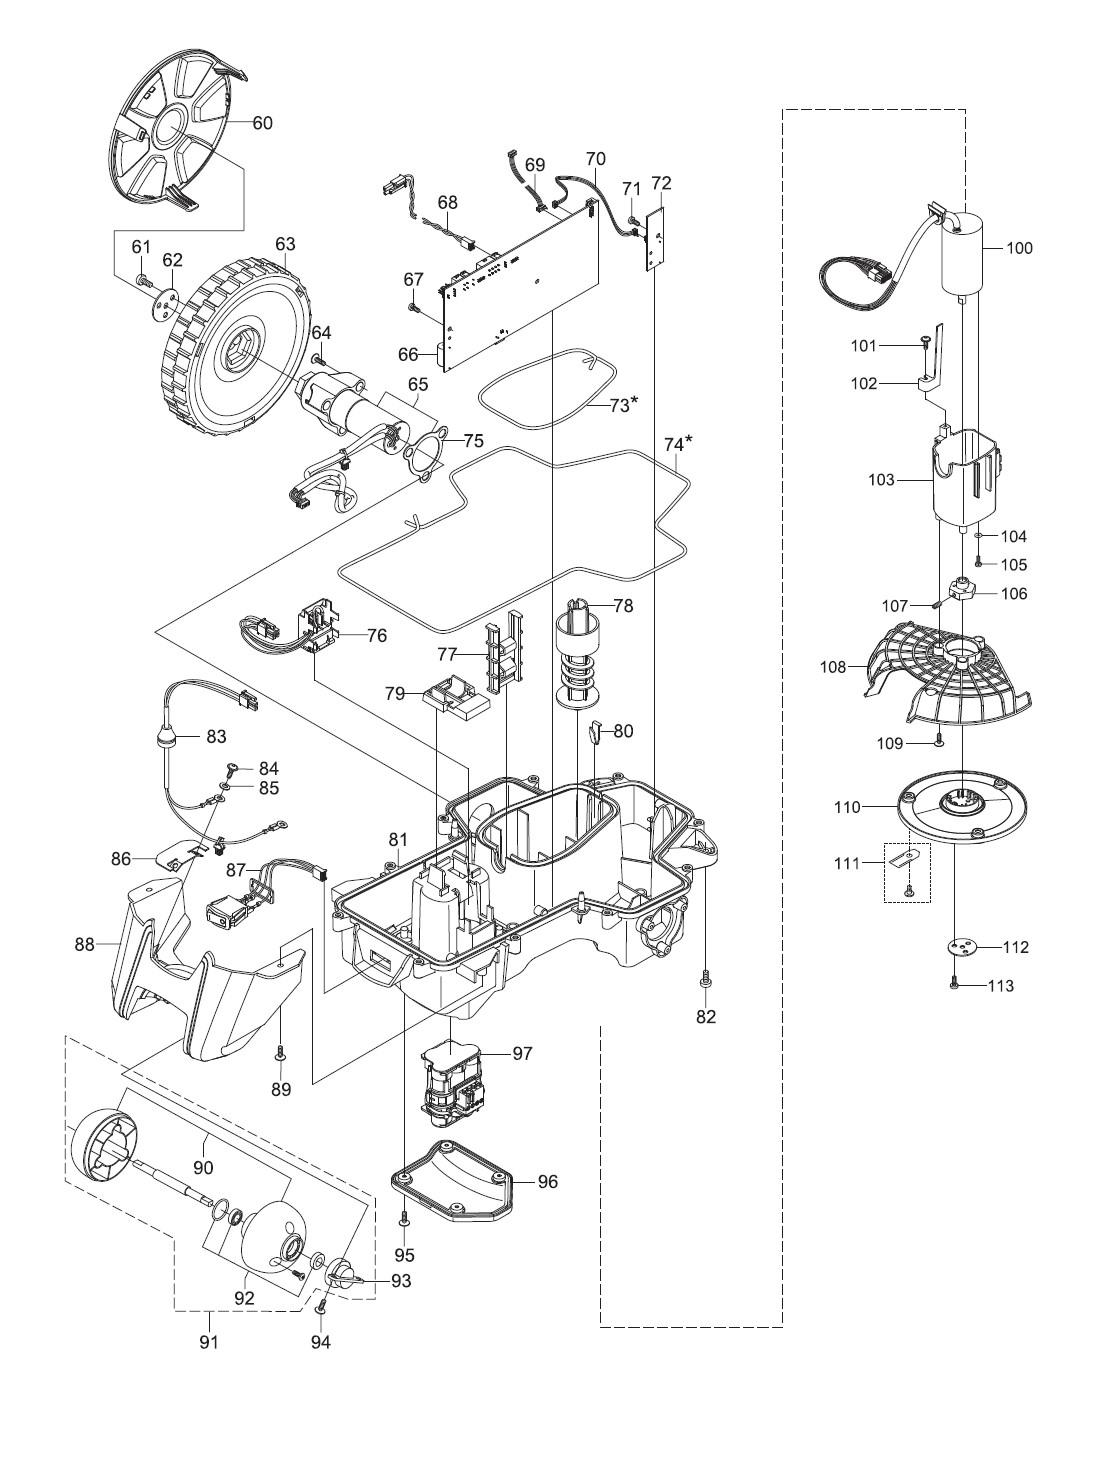 gardena ersatzteile unterteile m hroboter r80li 4069 20. Black Bedroom Furniture Sets. Home Design Ideas